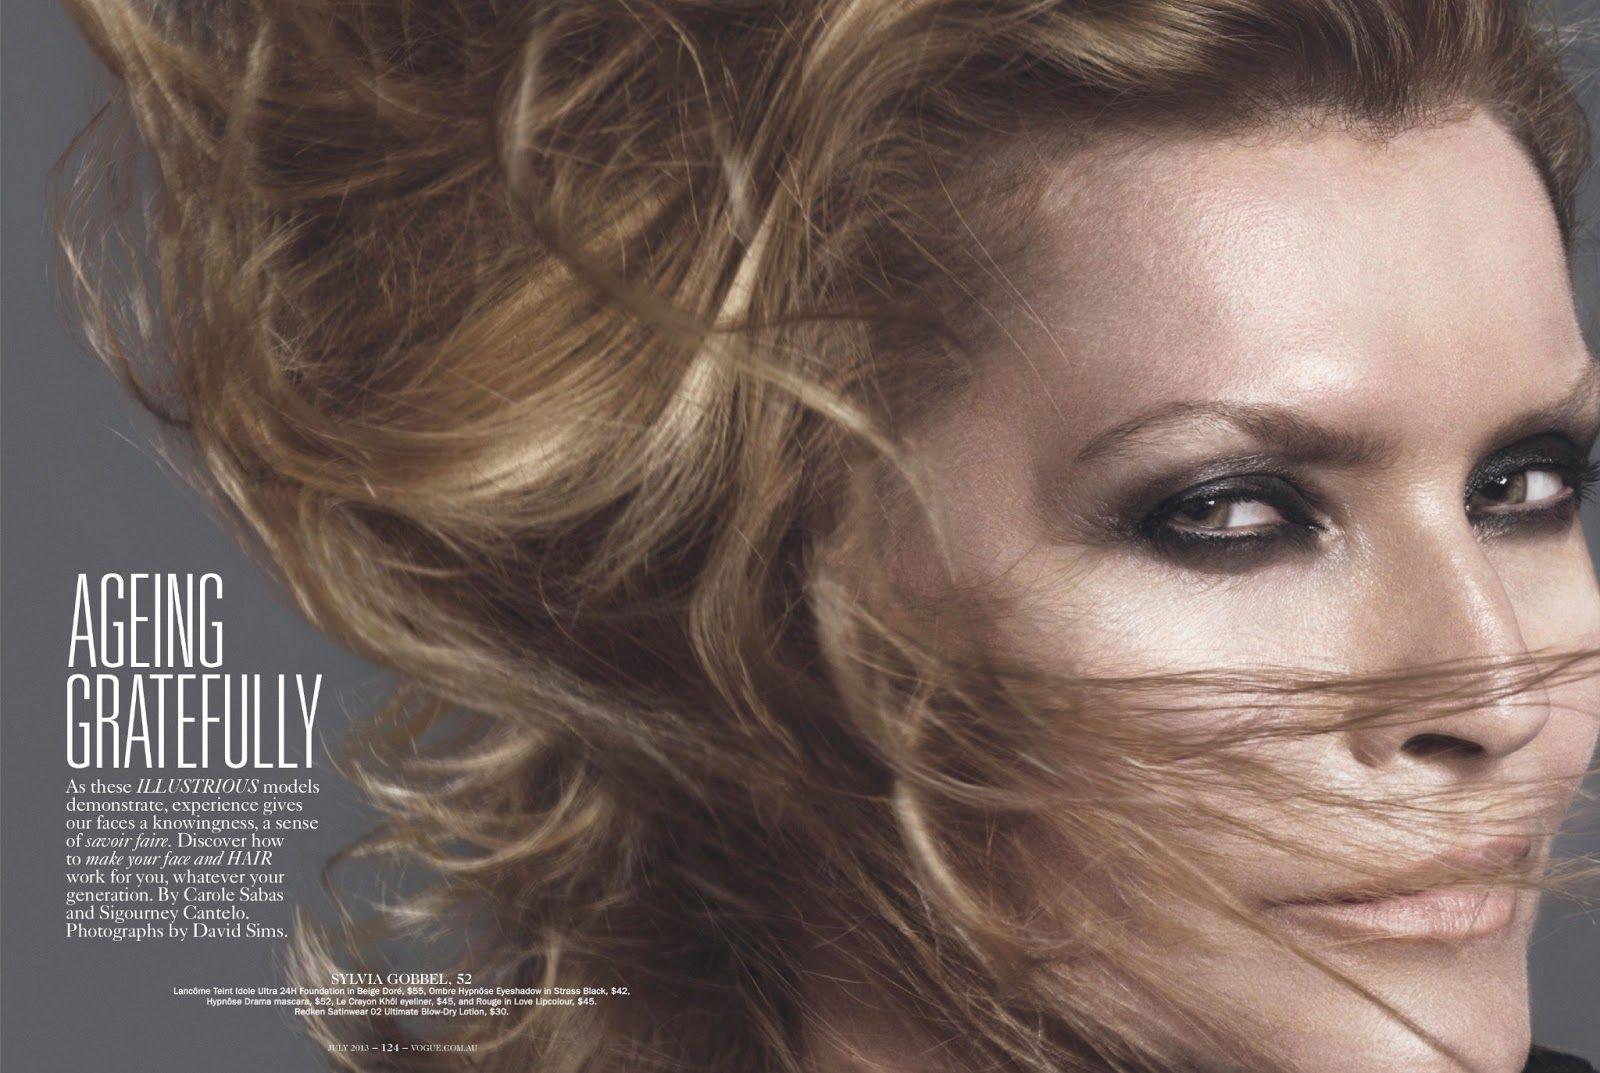 Vogue Australia July 2013  : Ageing Gratefully